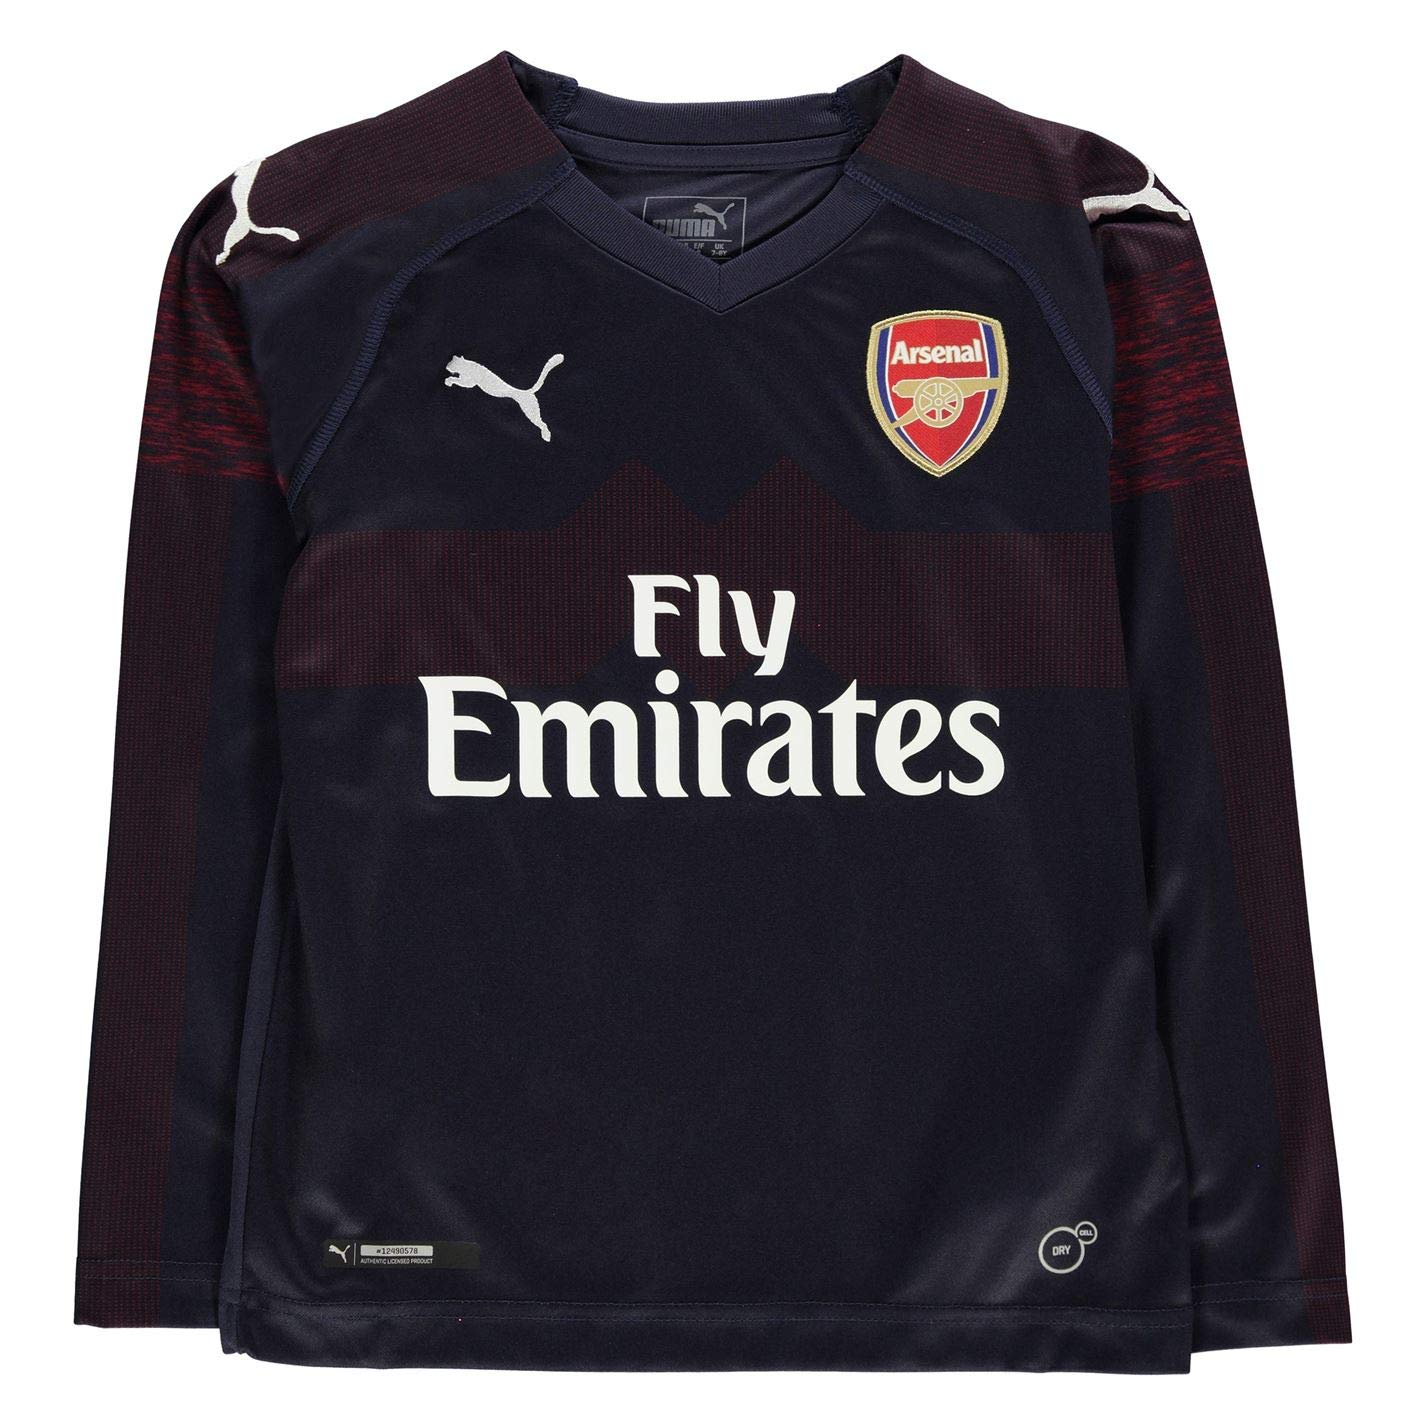 Puma 2018-2019 Arsenal Away Long Sleeve Shirt (Kids)